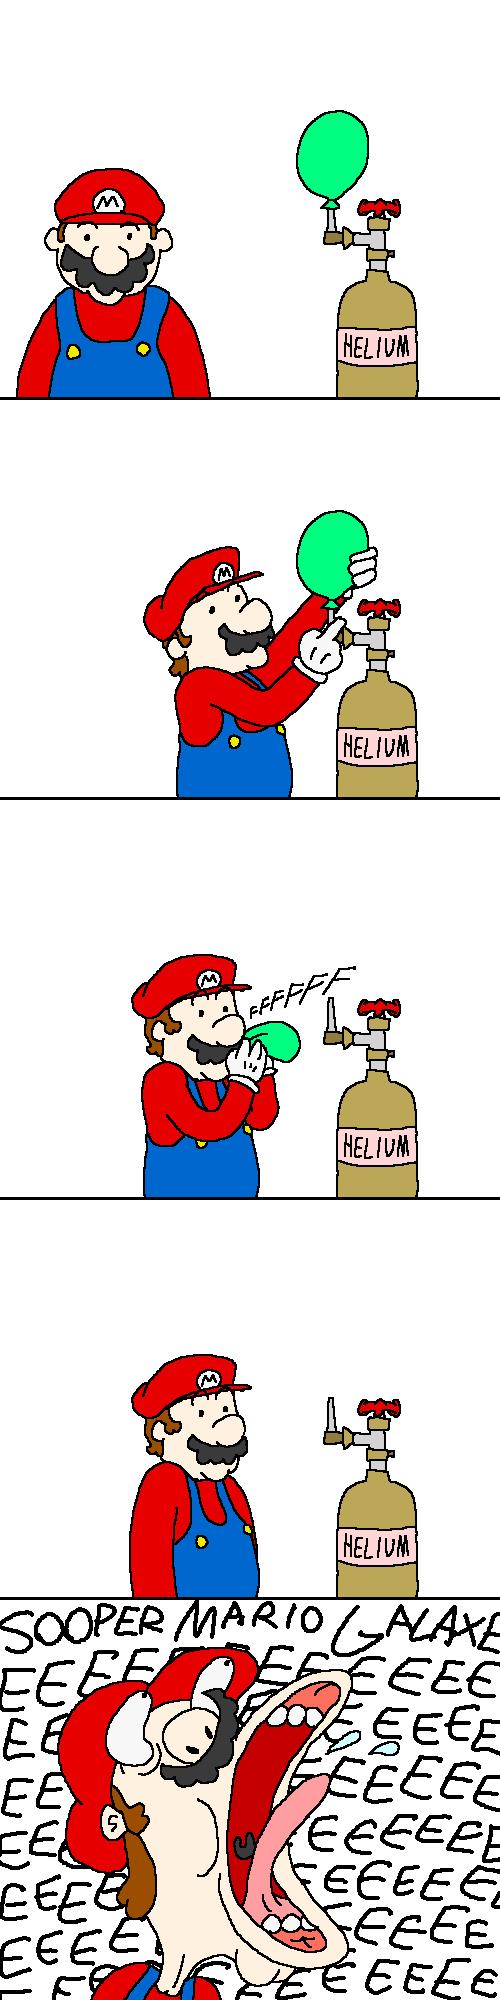 OH GOD NO. Mario, y u do this?. Mario funny GALAXEEEEEE